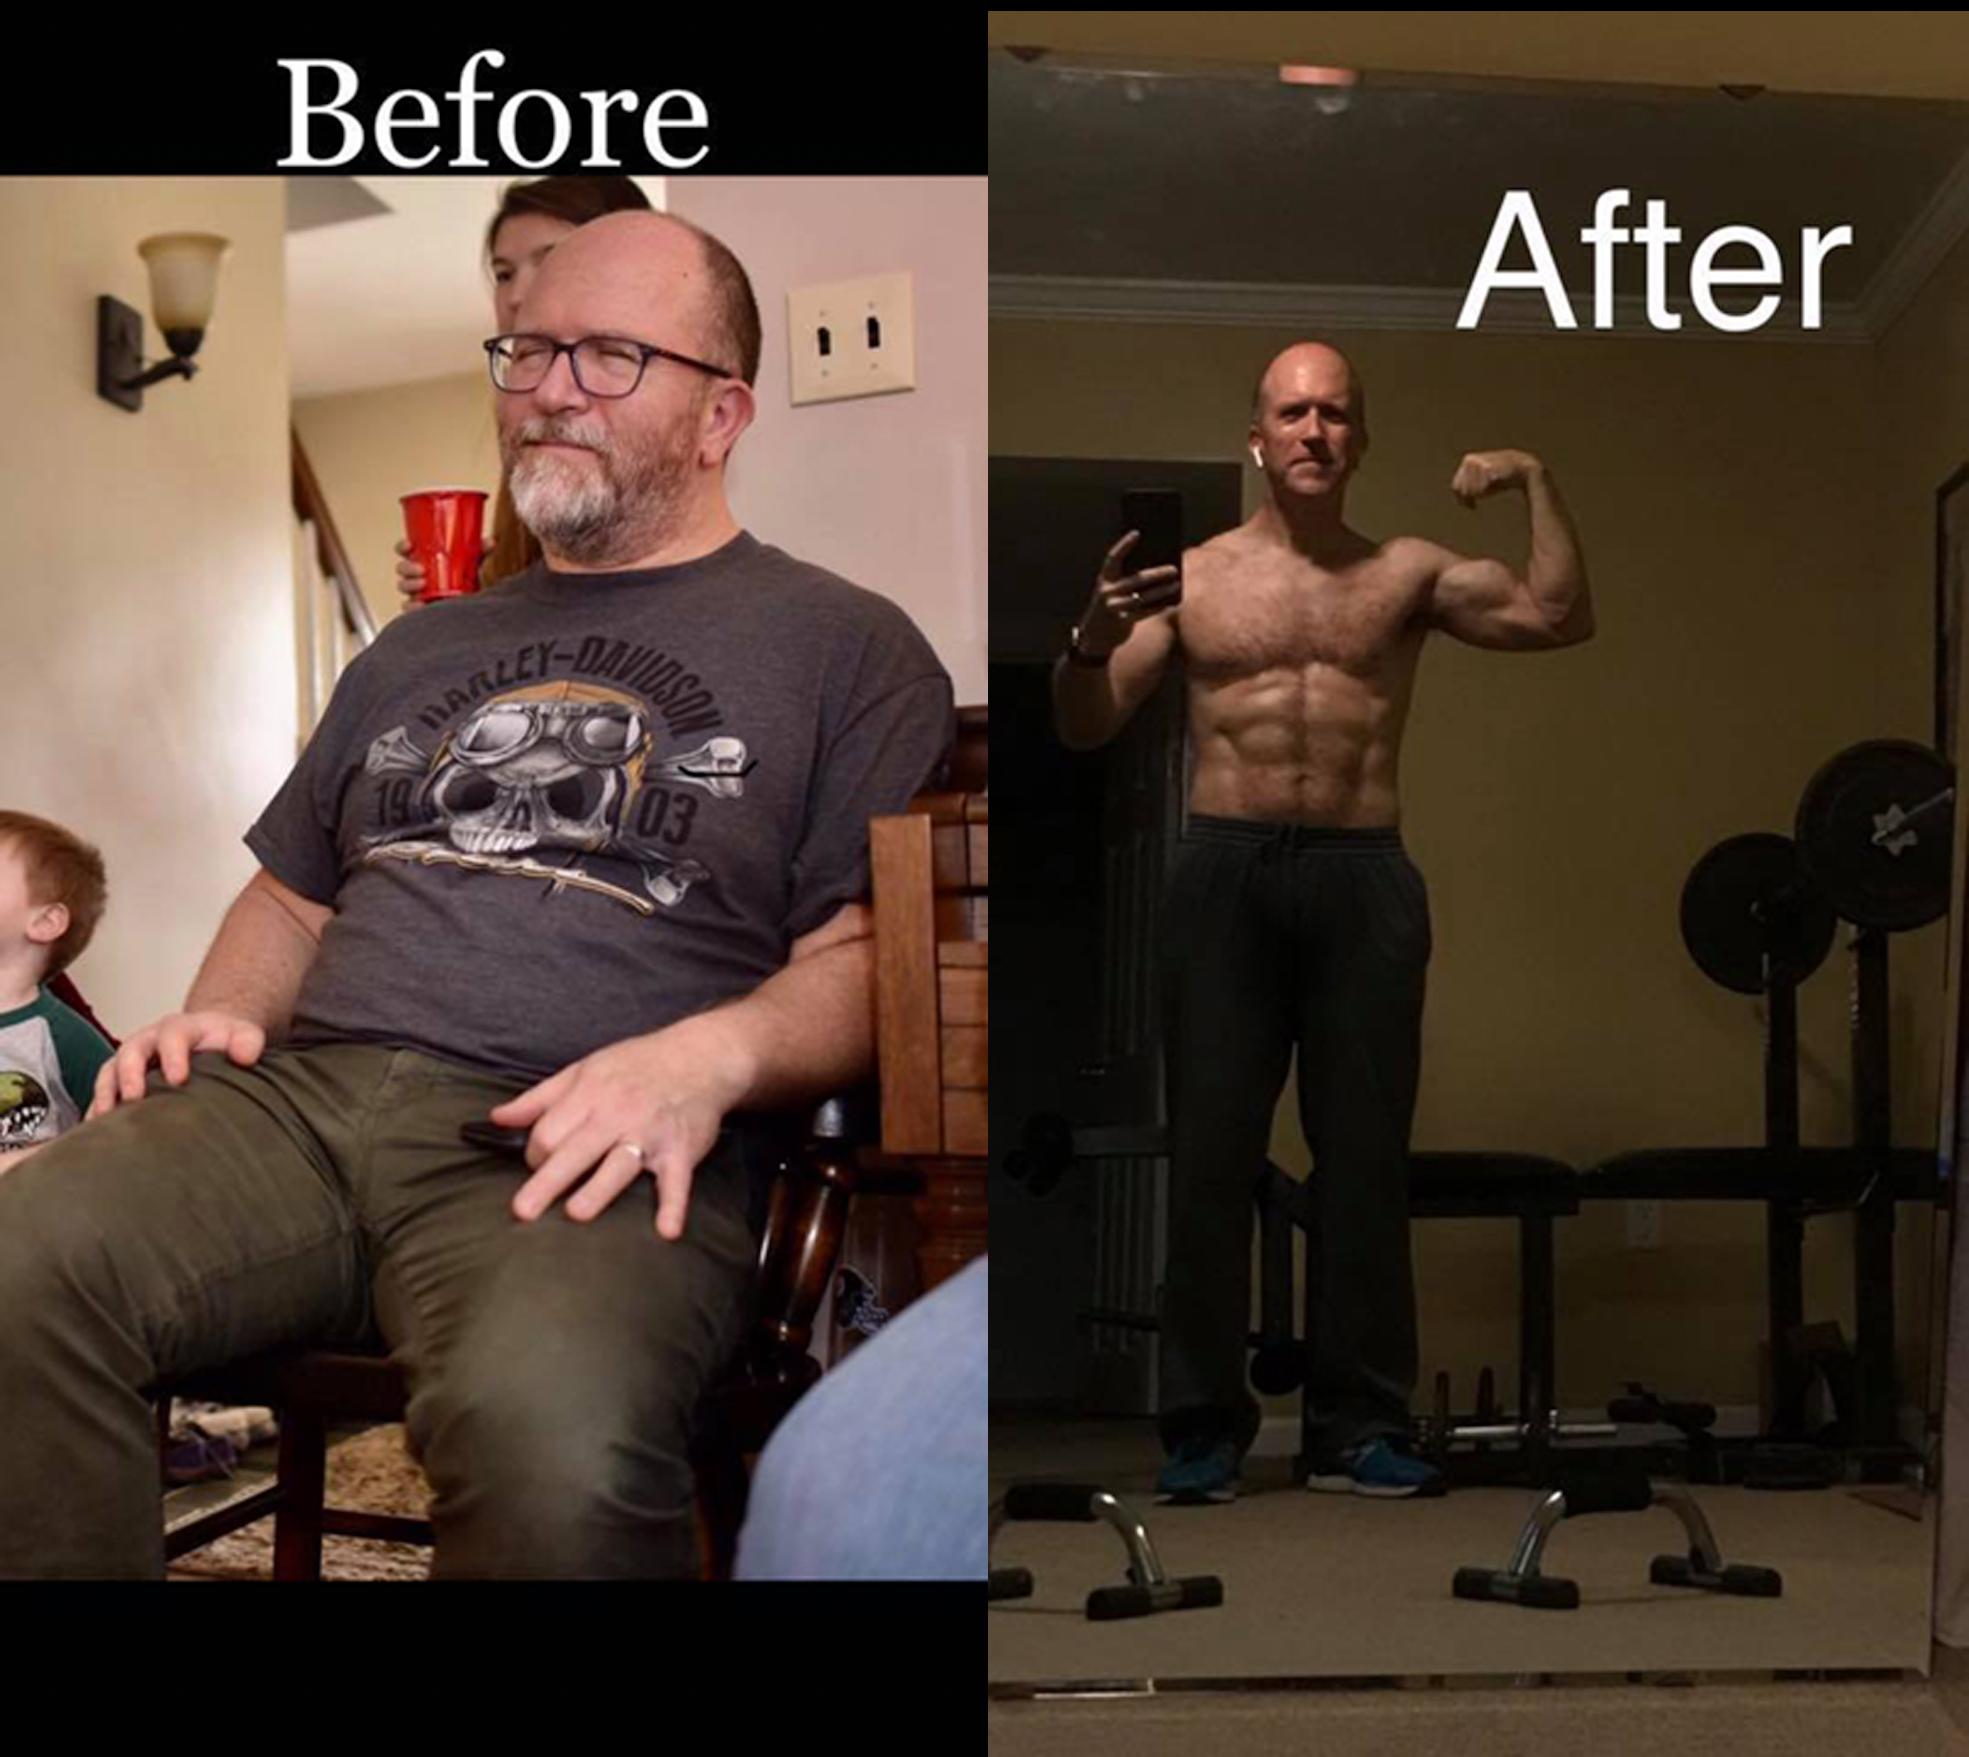 """60 lbs later, I am proud of myself"" — John"